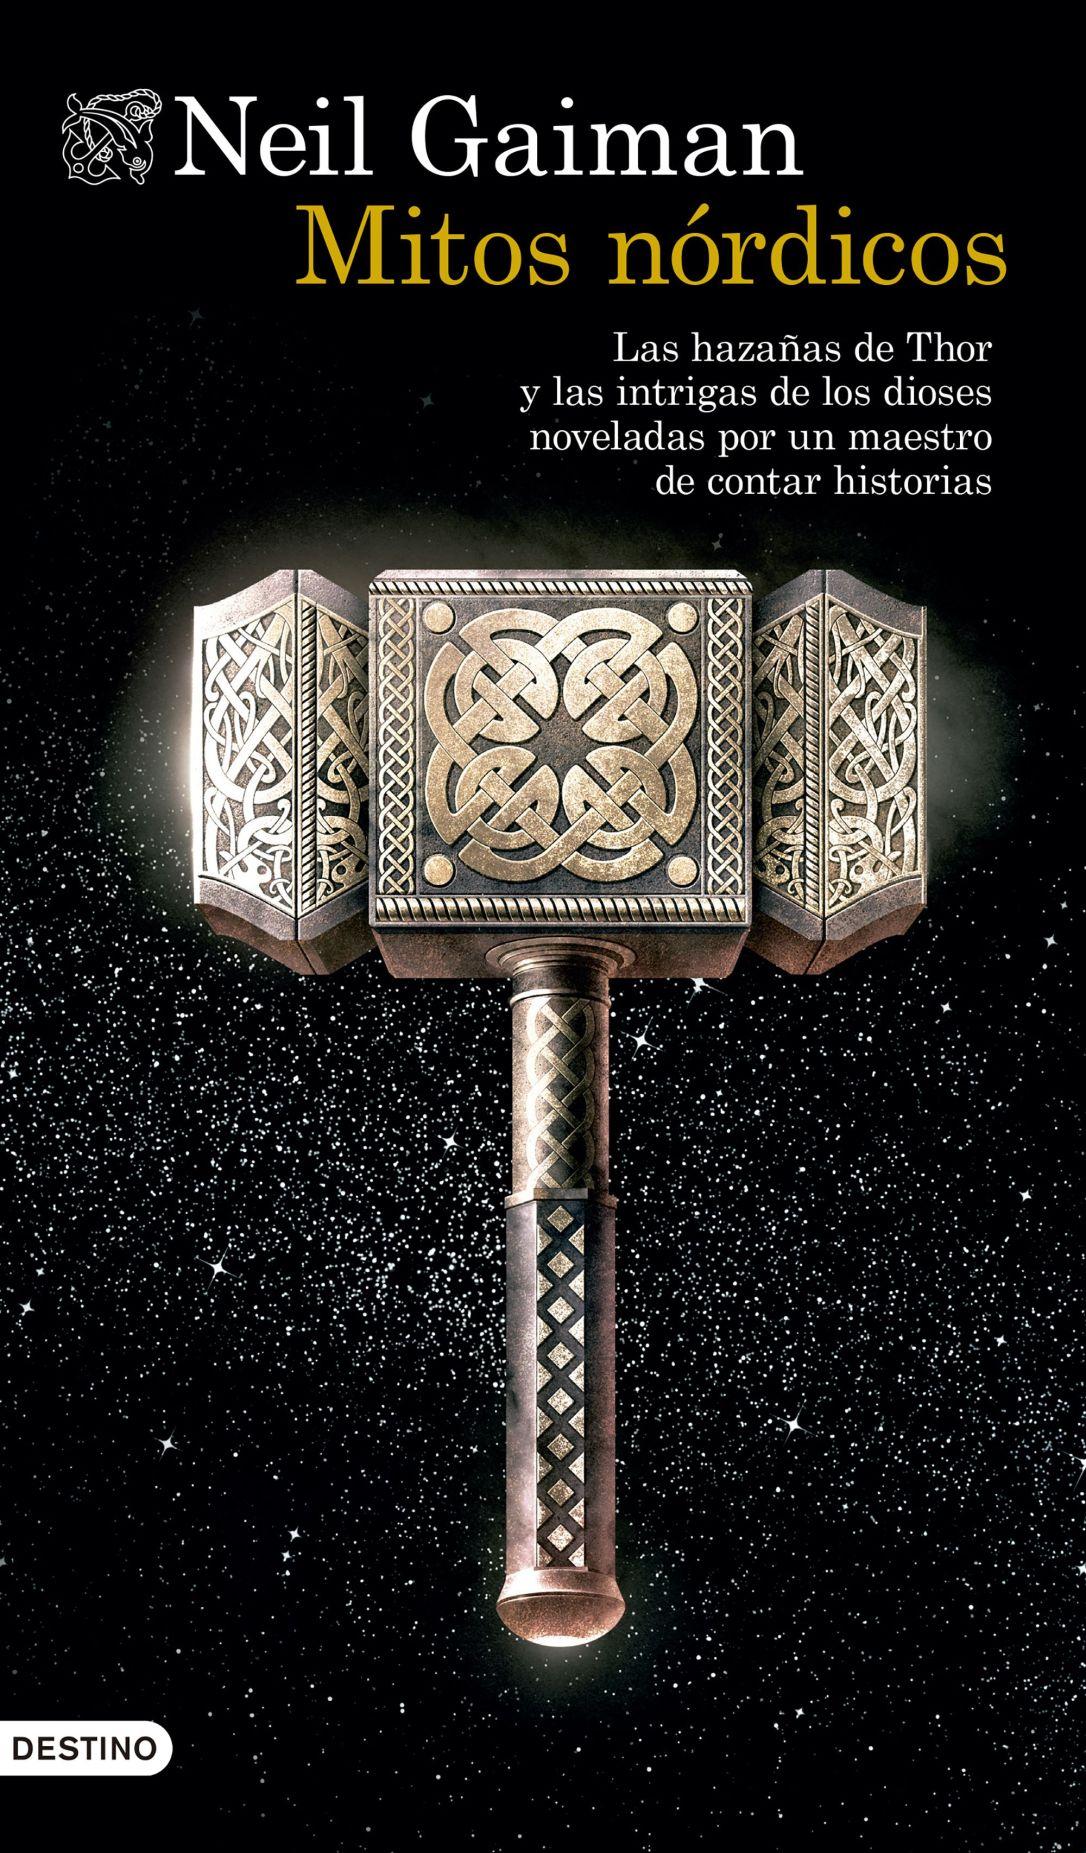 portada_mitos-nordicos_neil-gaiman_201707051714.jpg